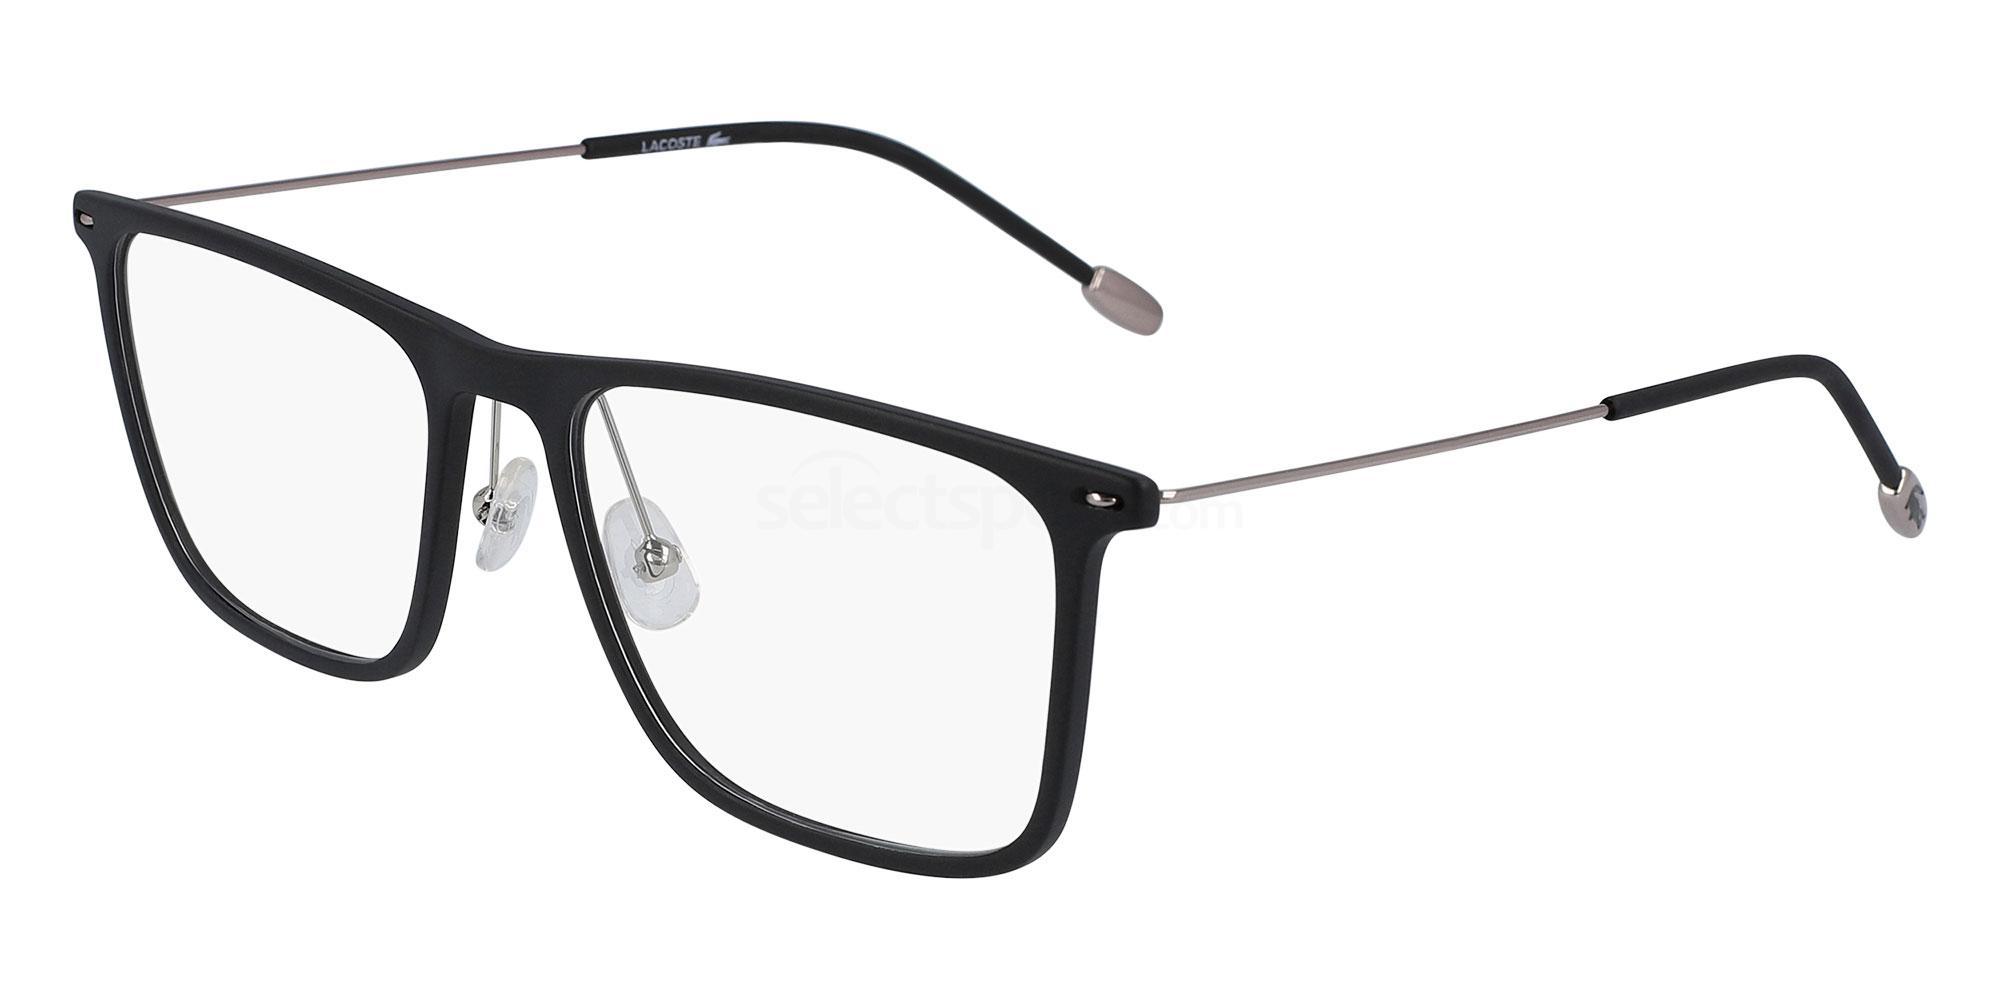 c5702b387925 Lacoste L2829 glasses. Free lenses   delivery